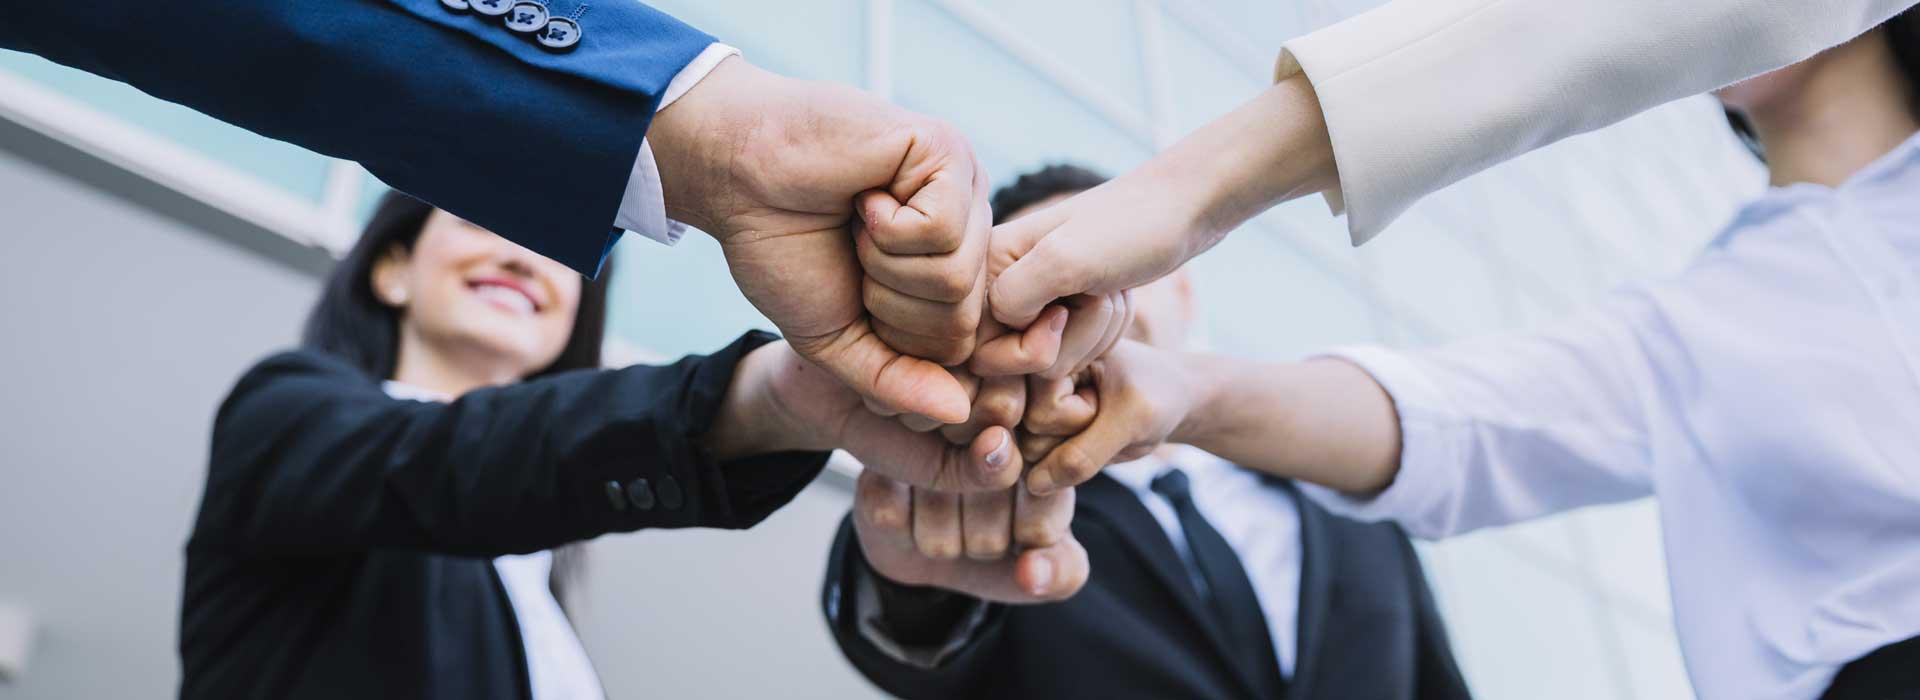 Conexión Total con tu Empresa estés donde estés